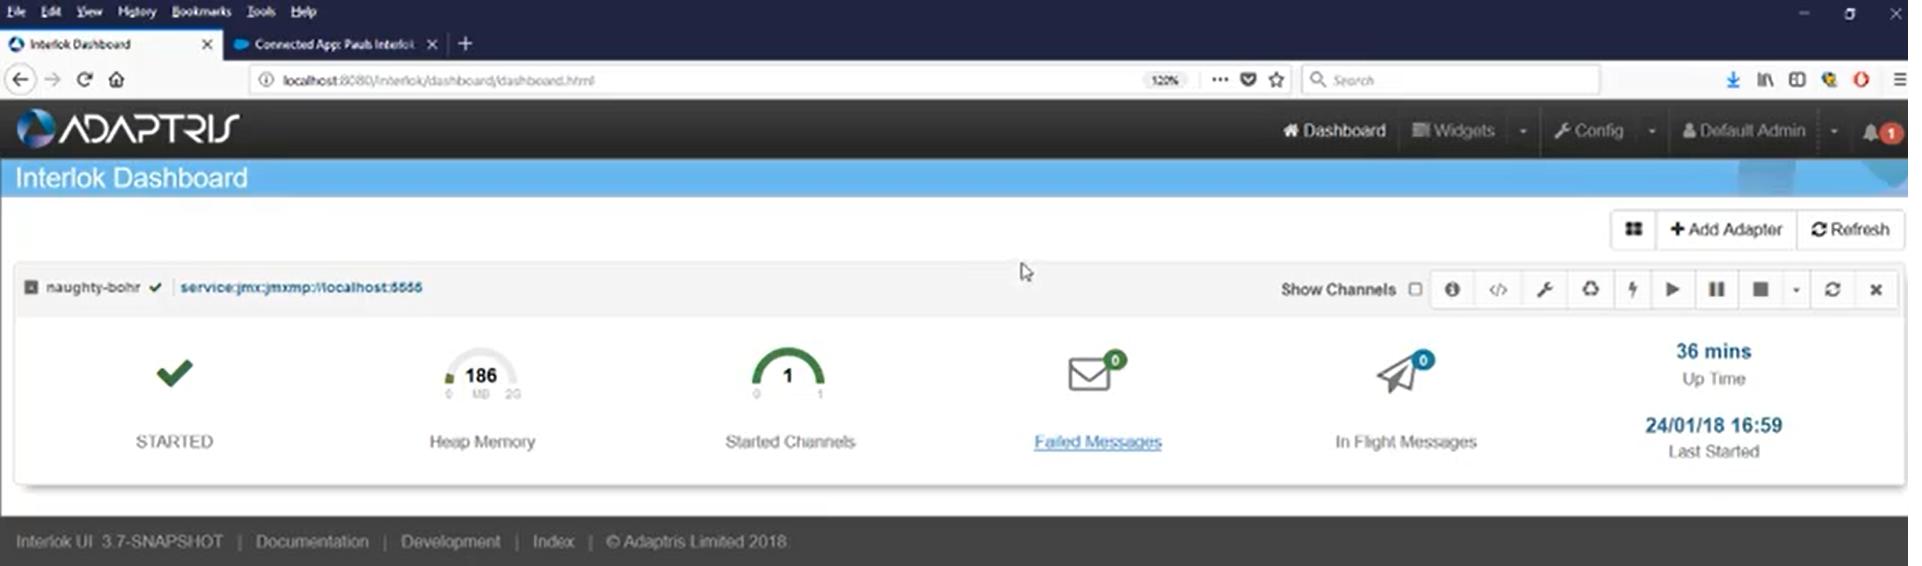 Adaptris Interlok Software - Interlok homepage